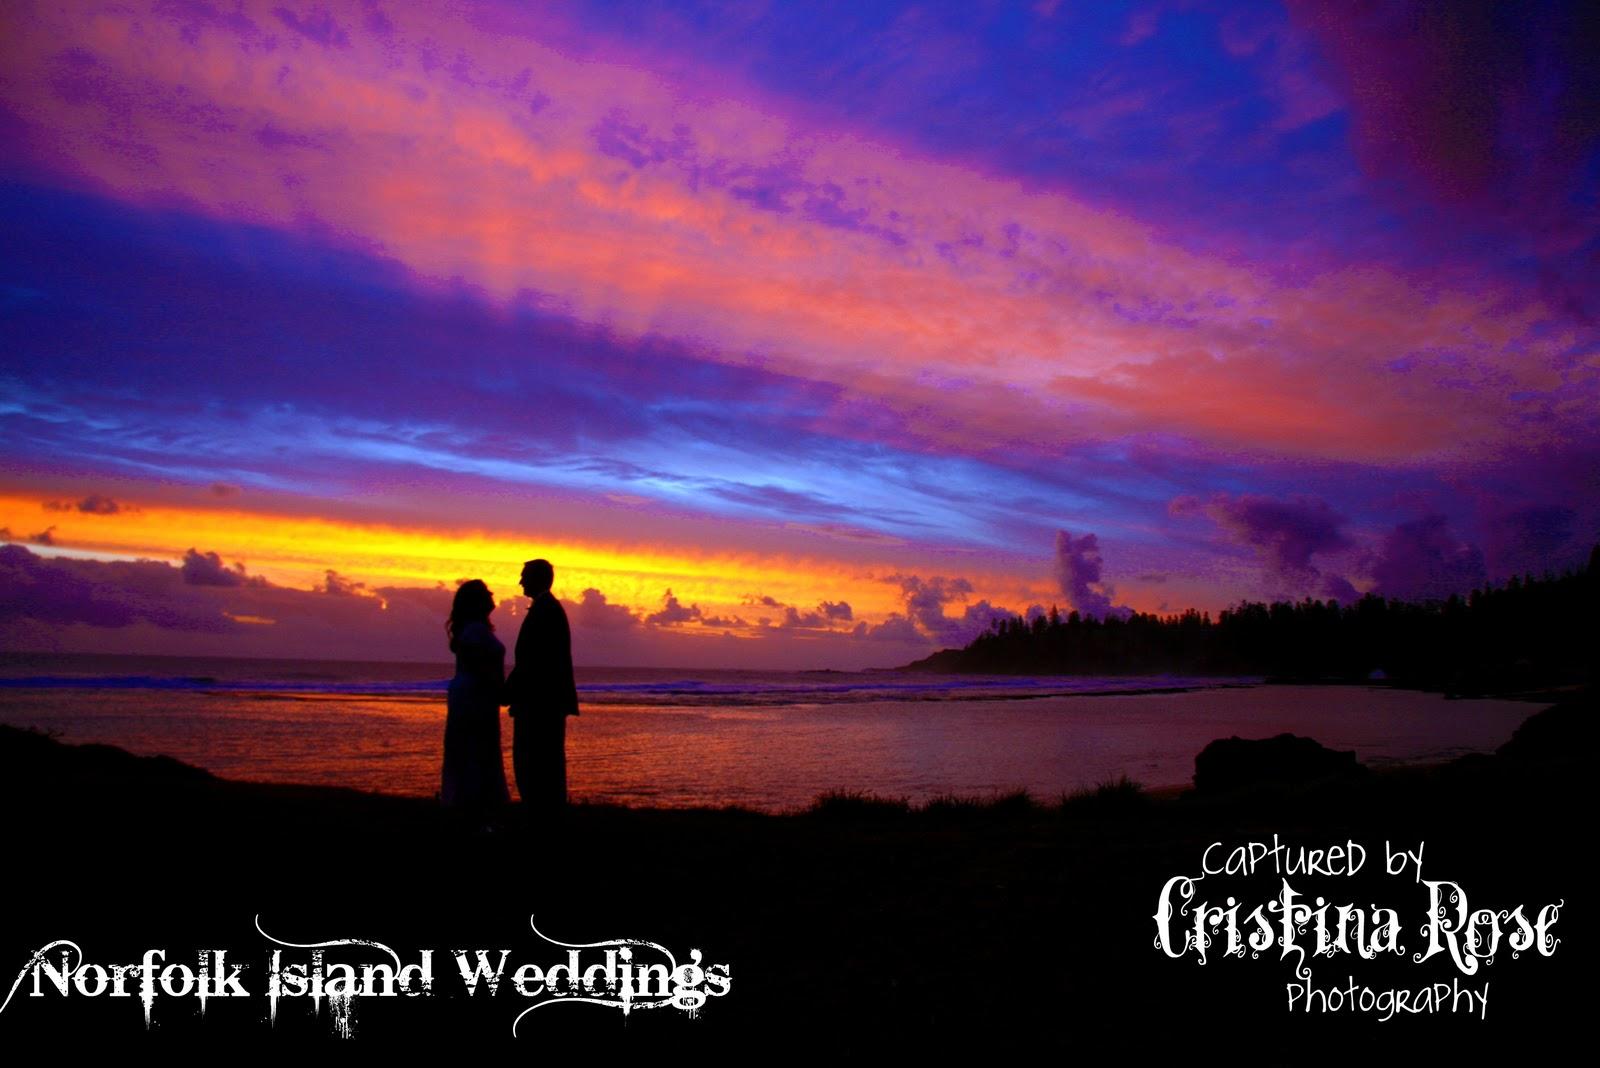 Norfolk island dating